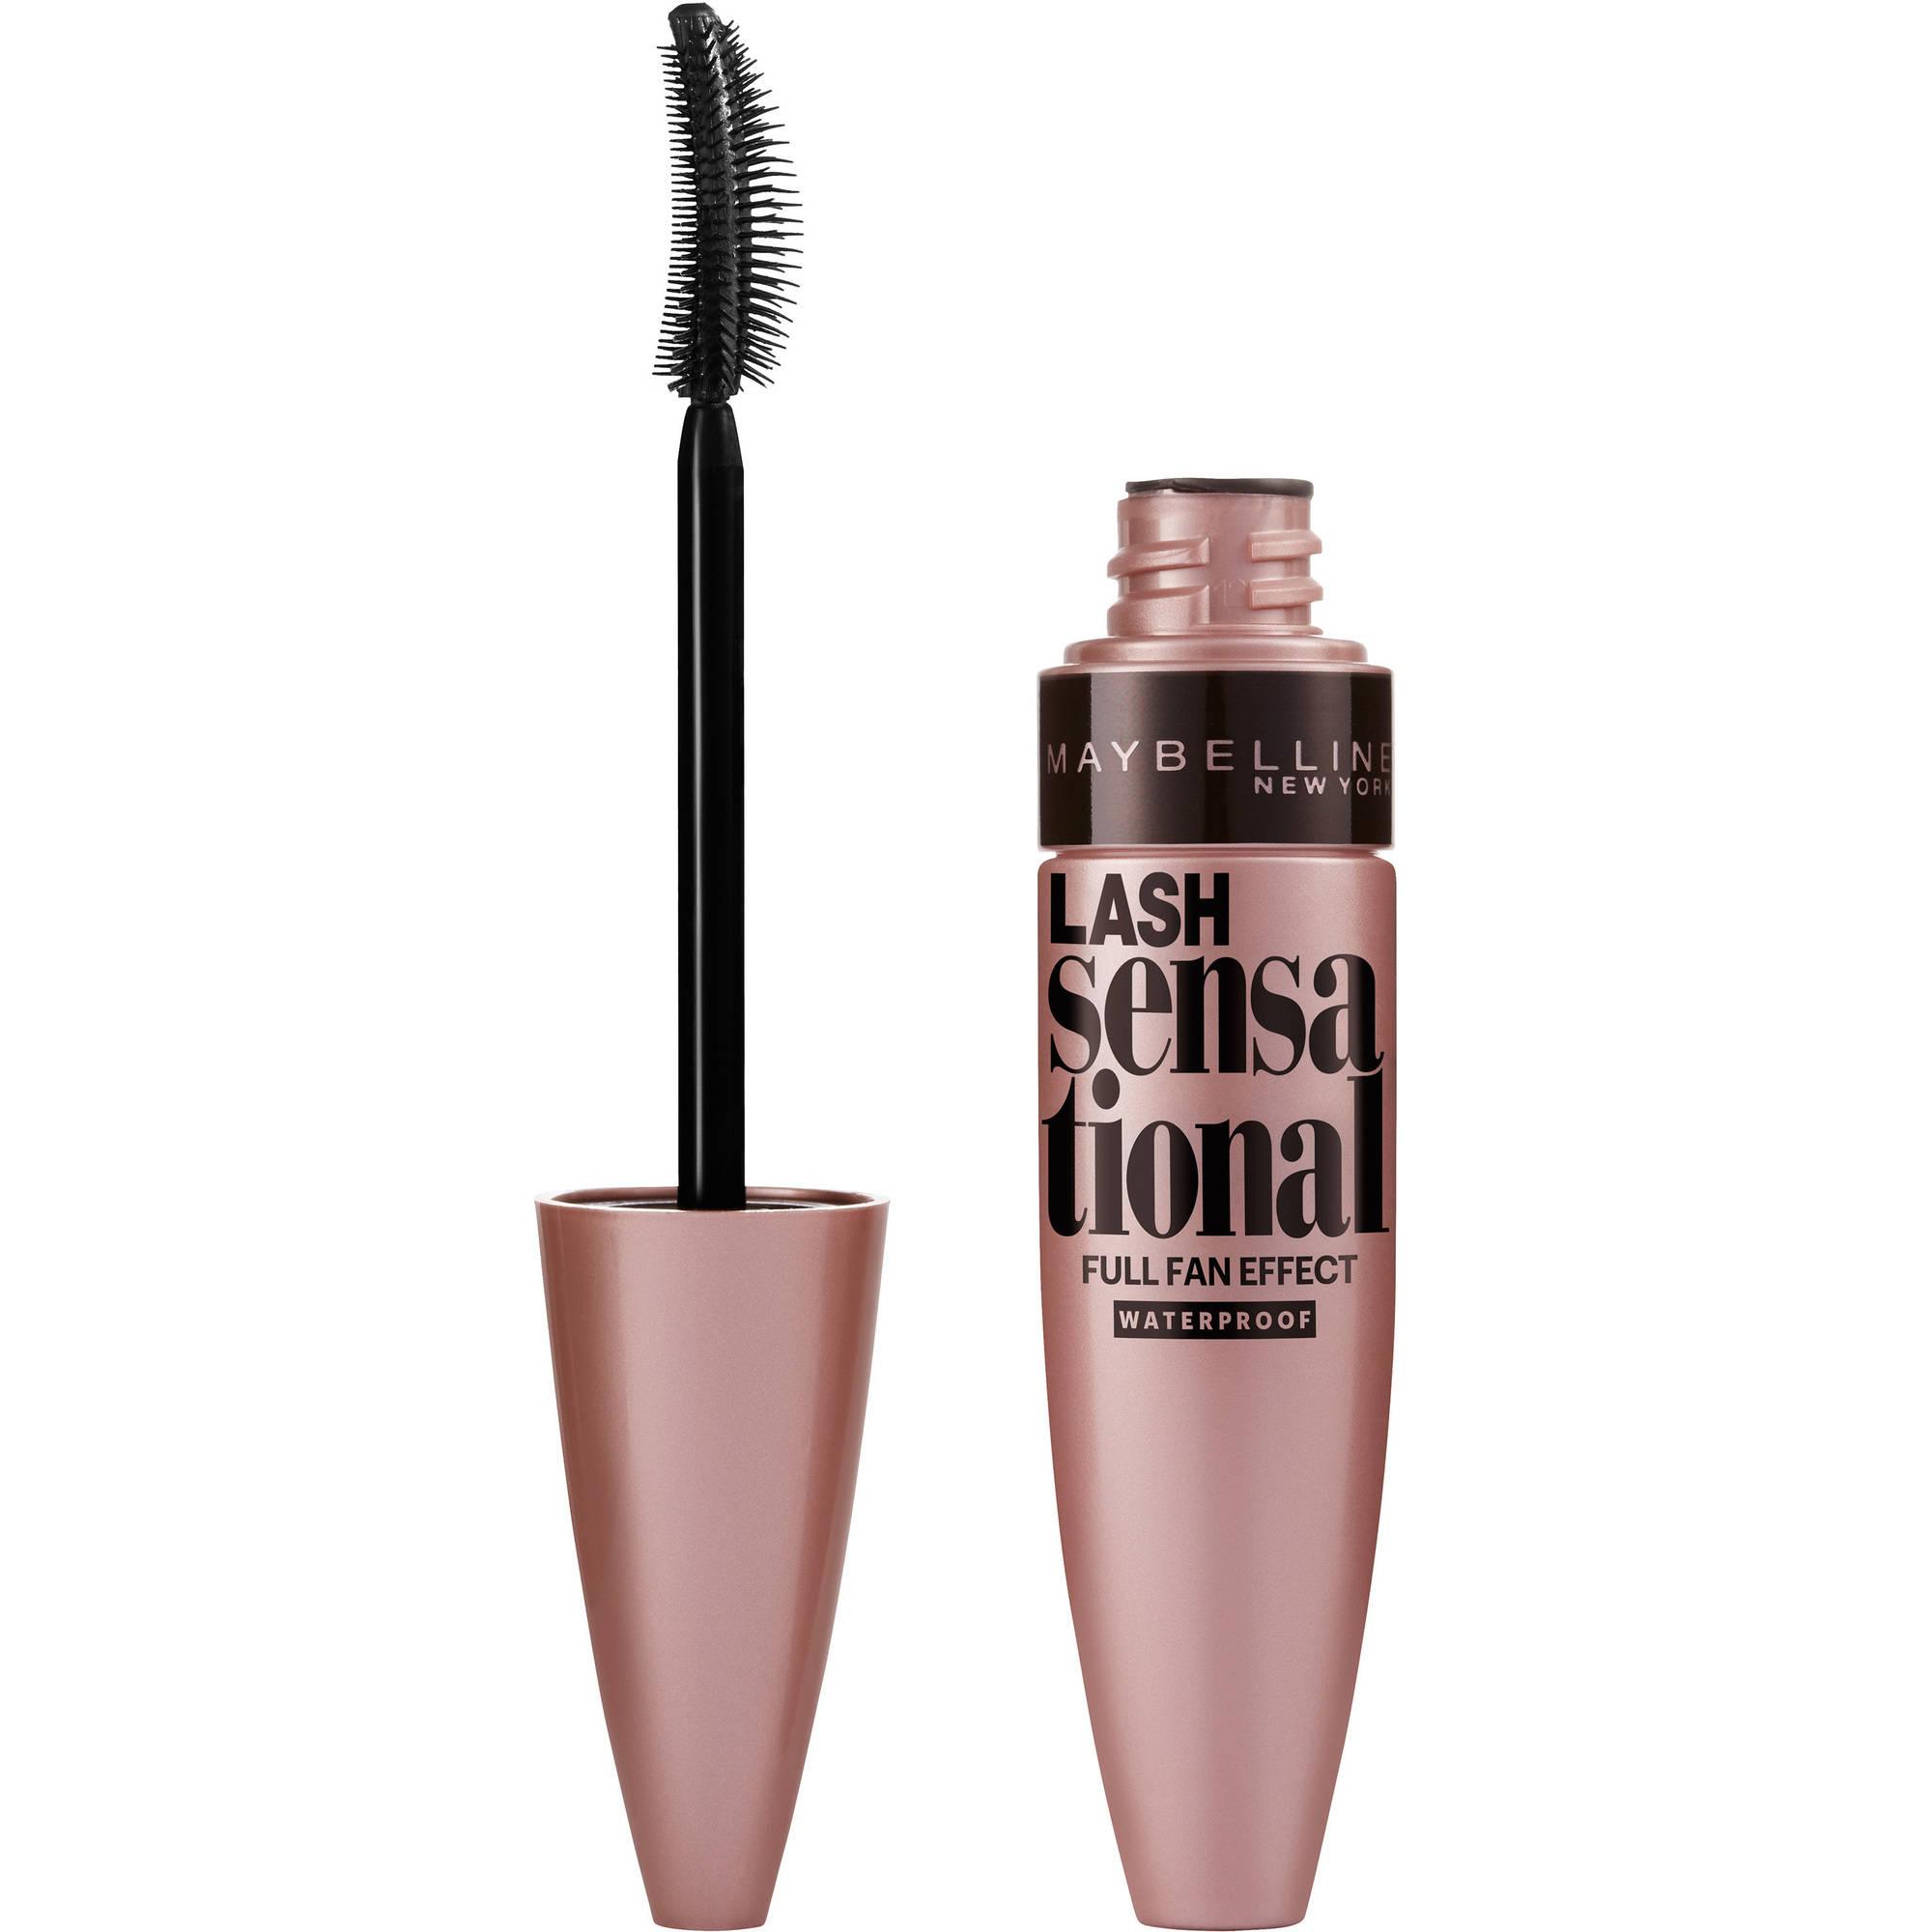 Image result for Lash Sensational Waterproof Mascara